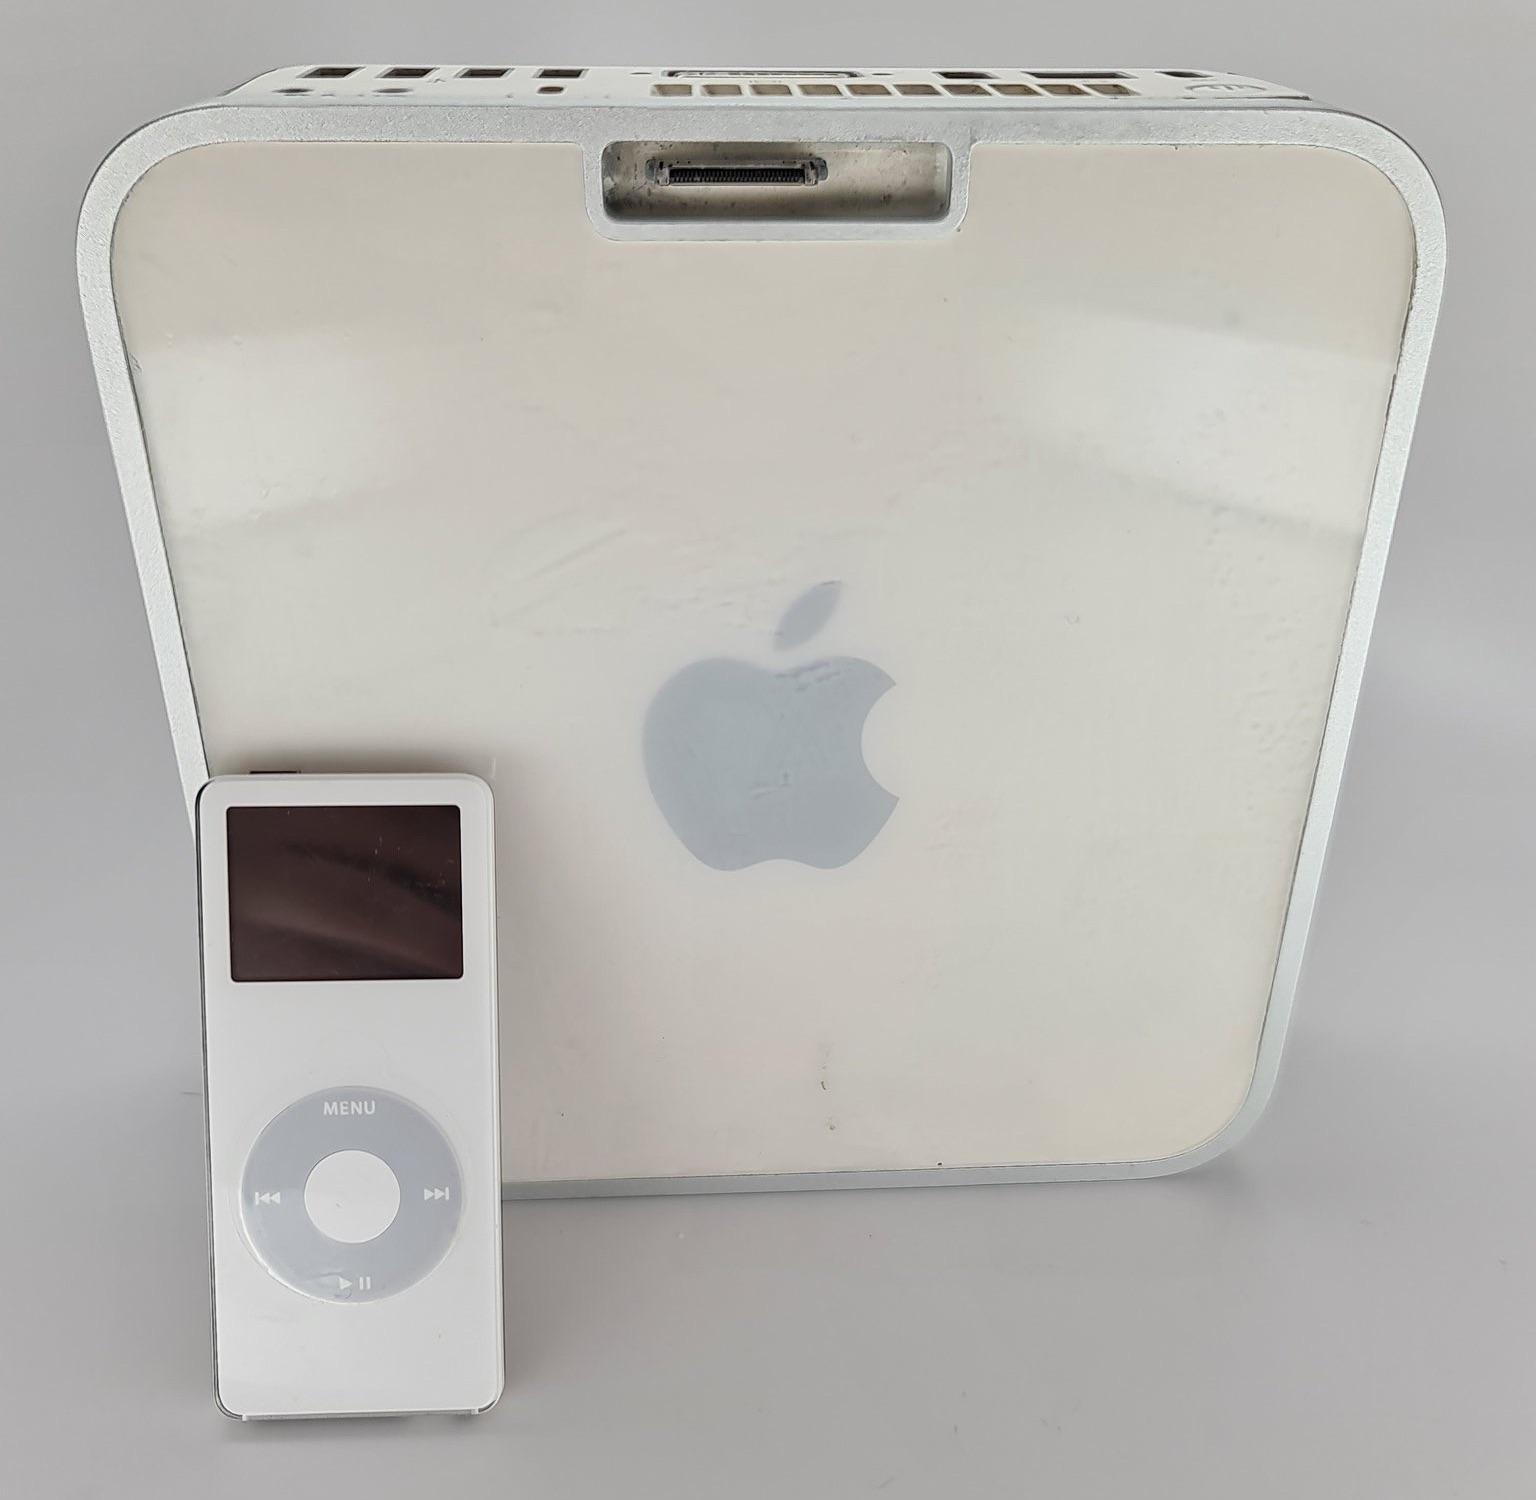 iPod nano voor prototype Mac mini.